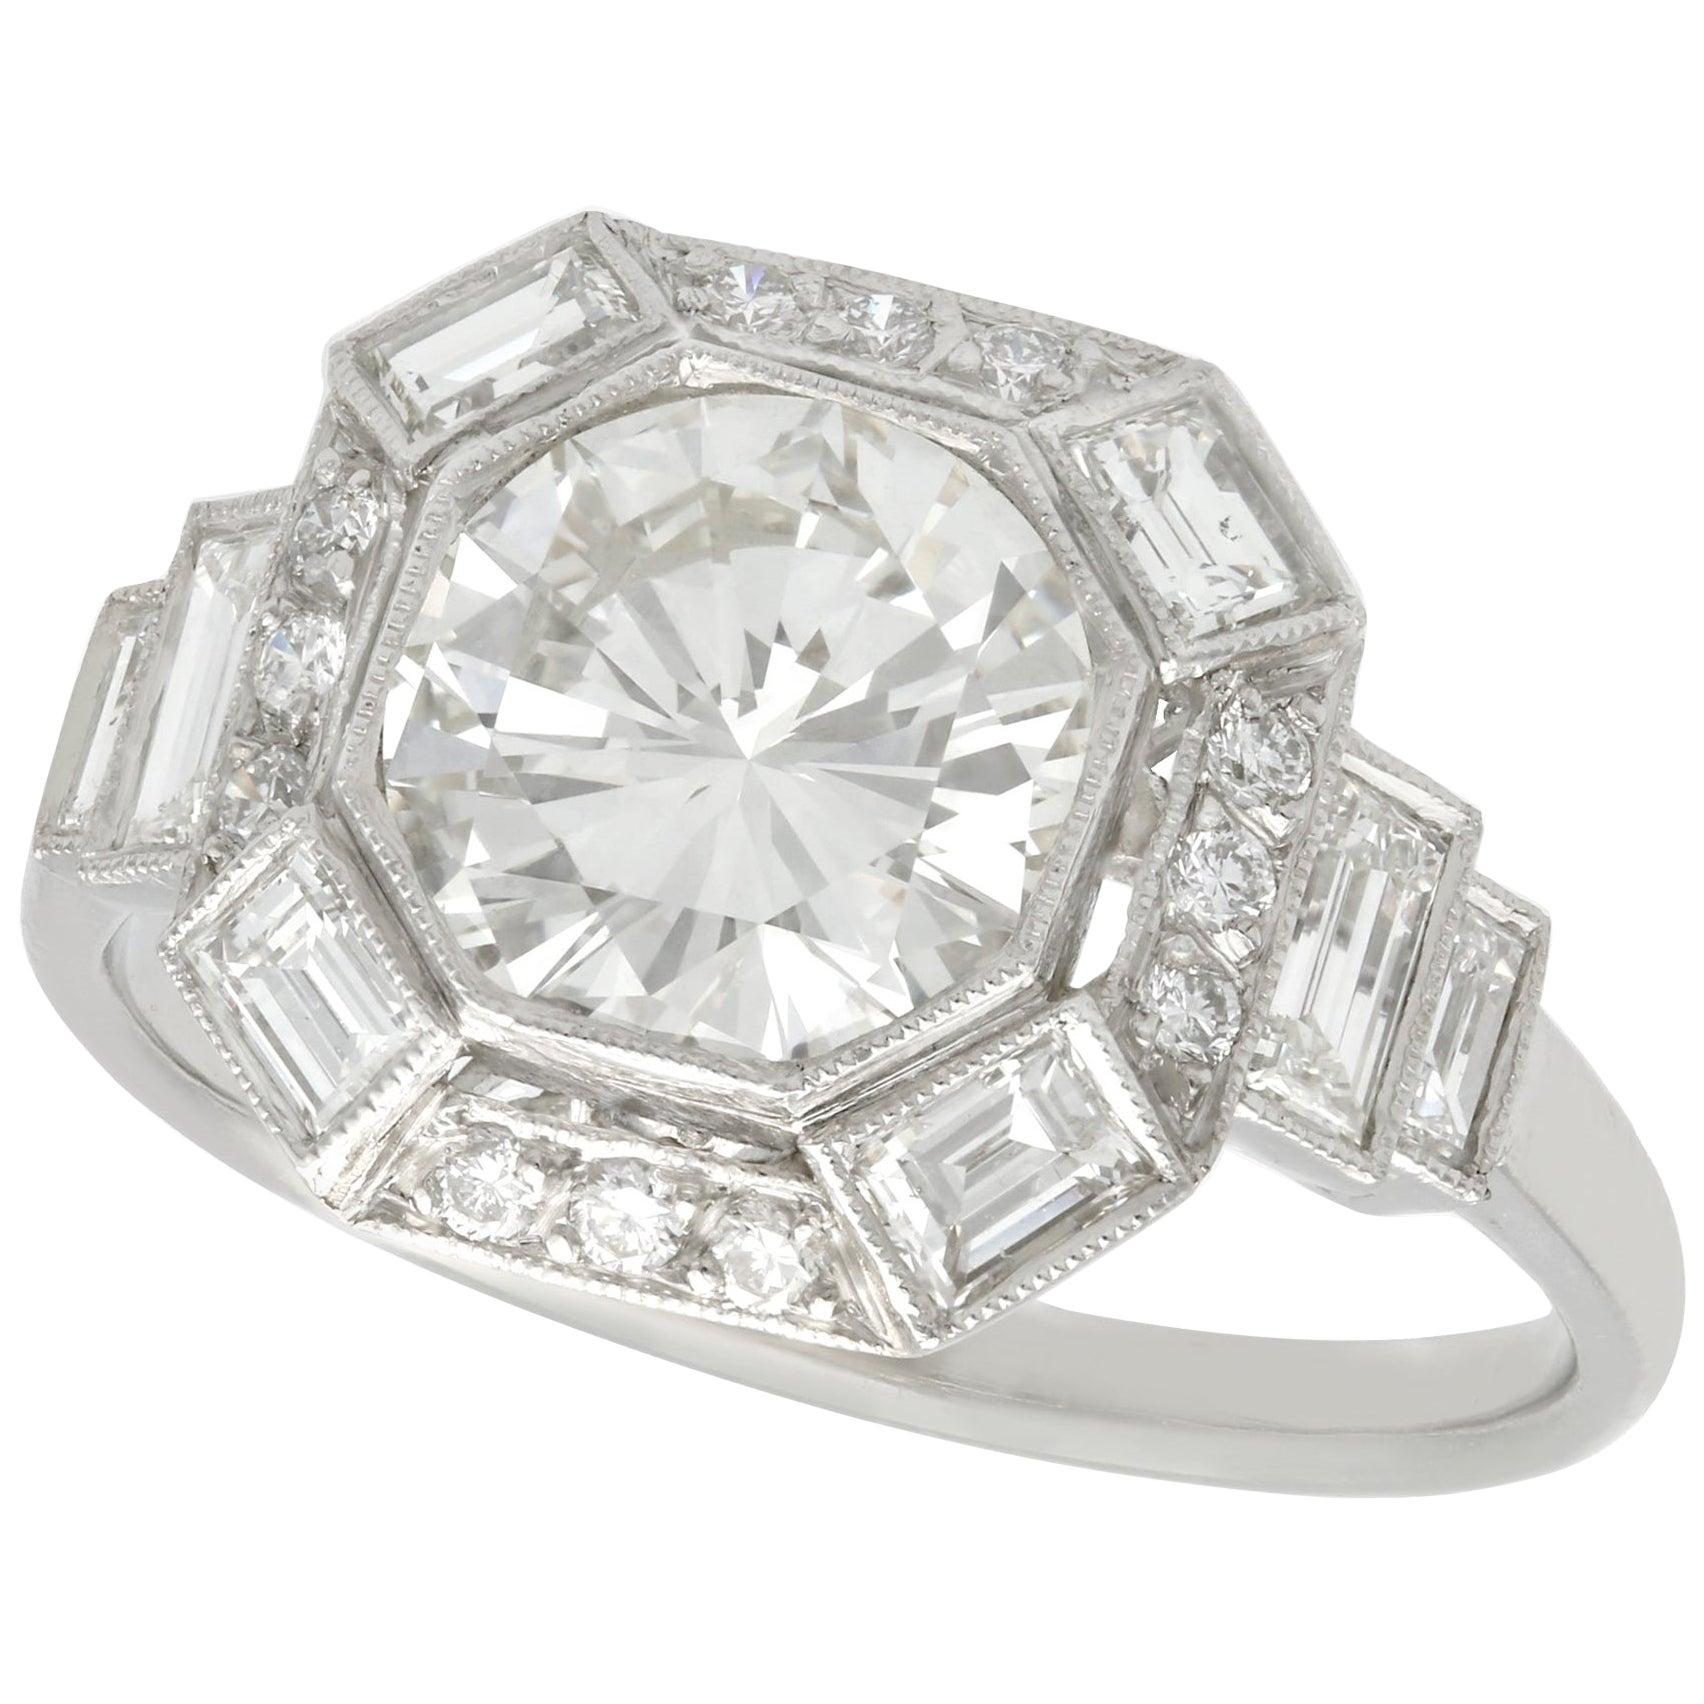 Art Deco Style 2.58 Carat Diamond and Platinum Engagement Ring